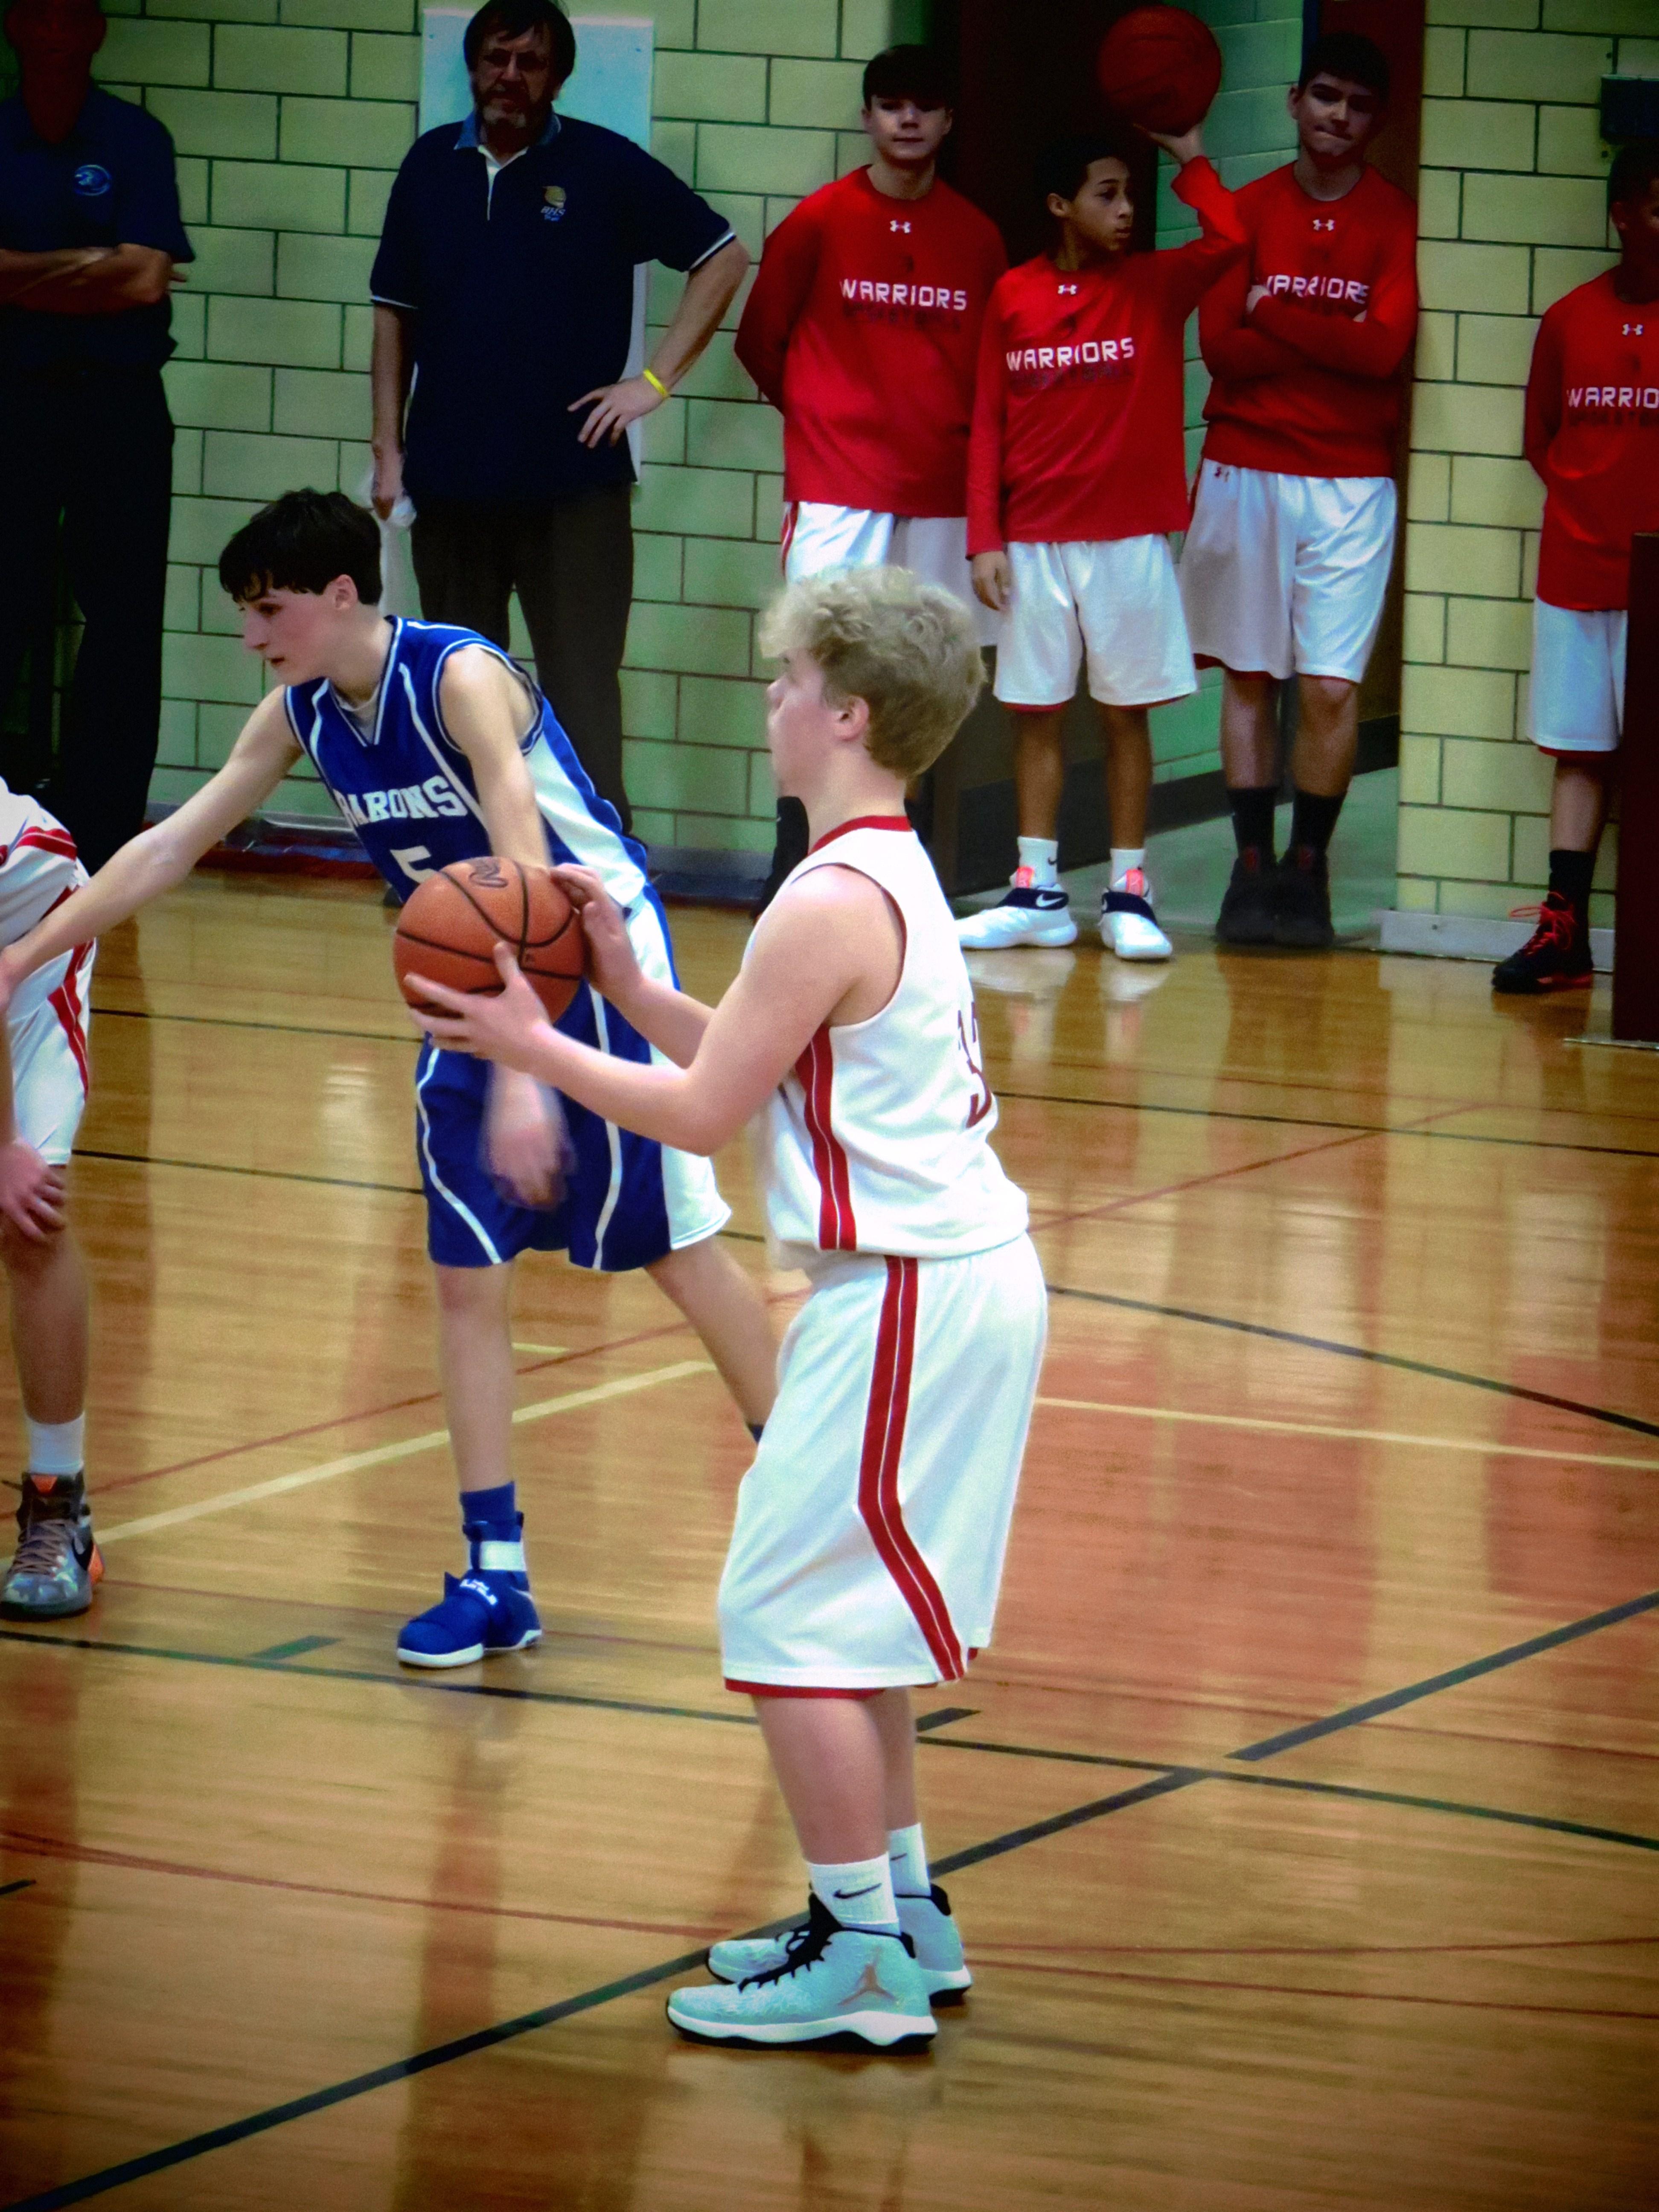 8th grader Ashton Harris